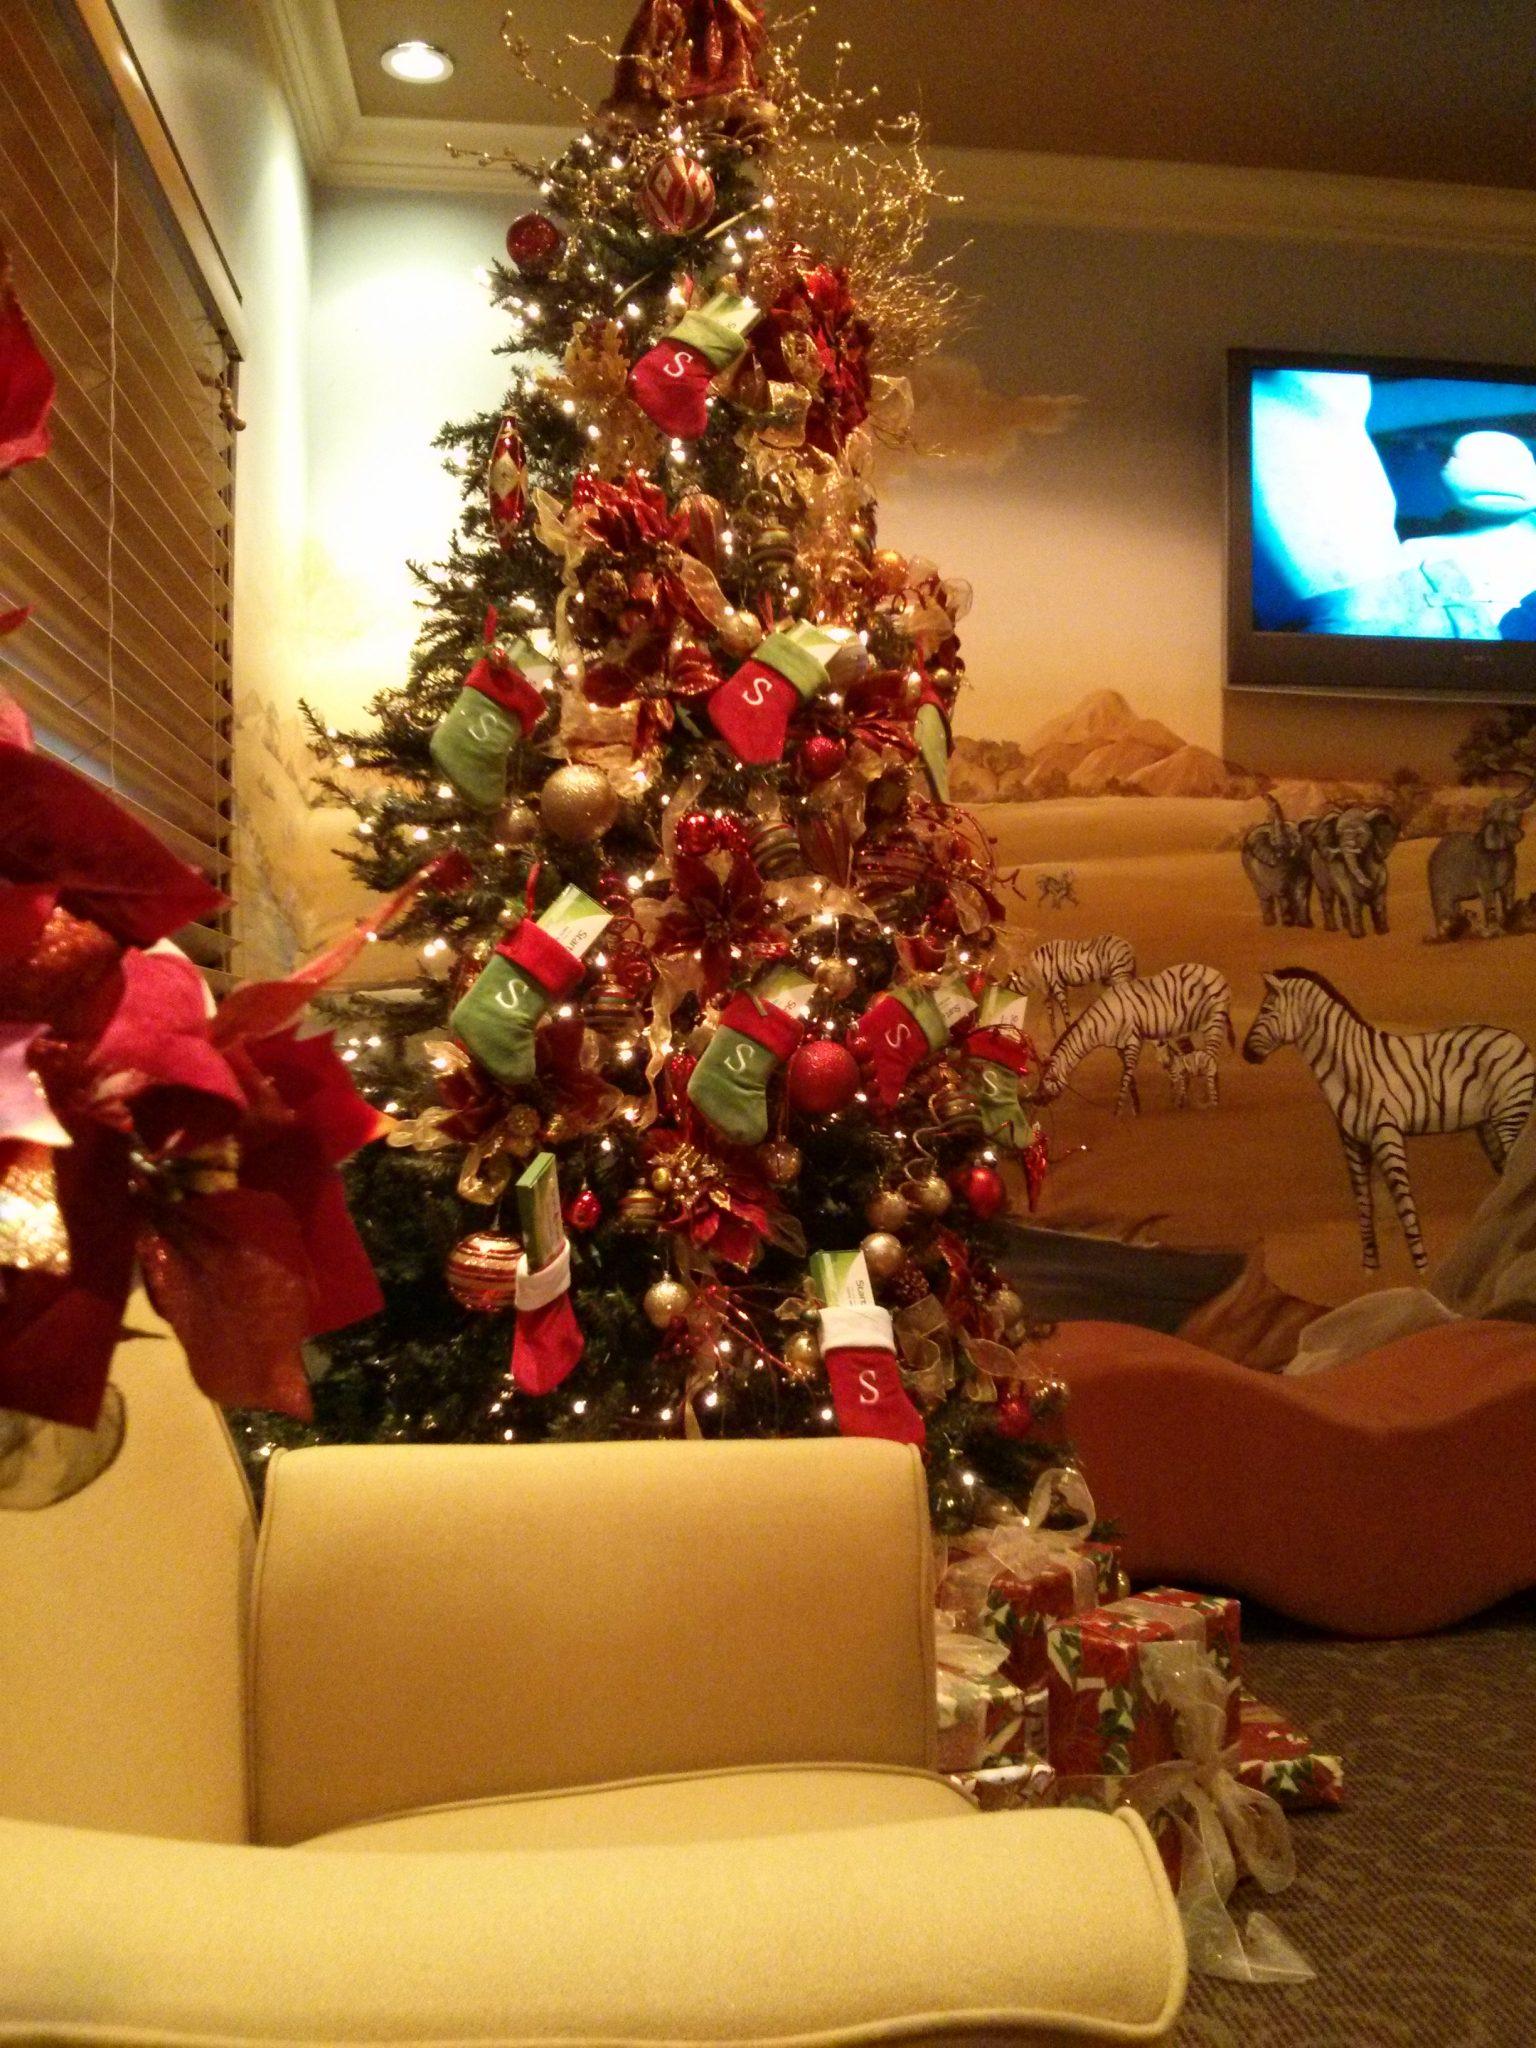 Christmas Gift Ideas - Foodwanderer